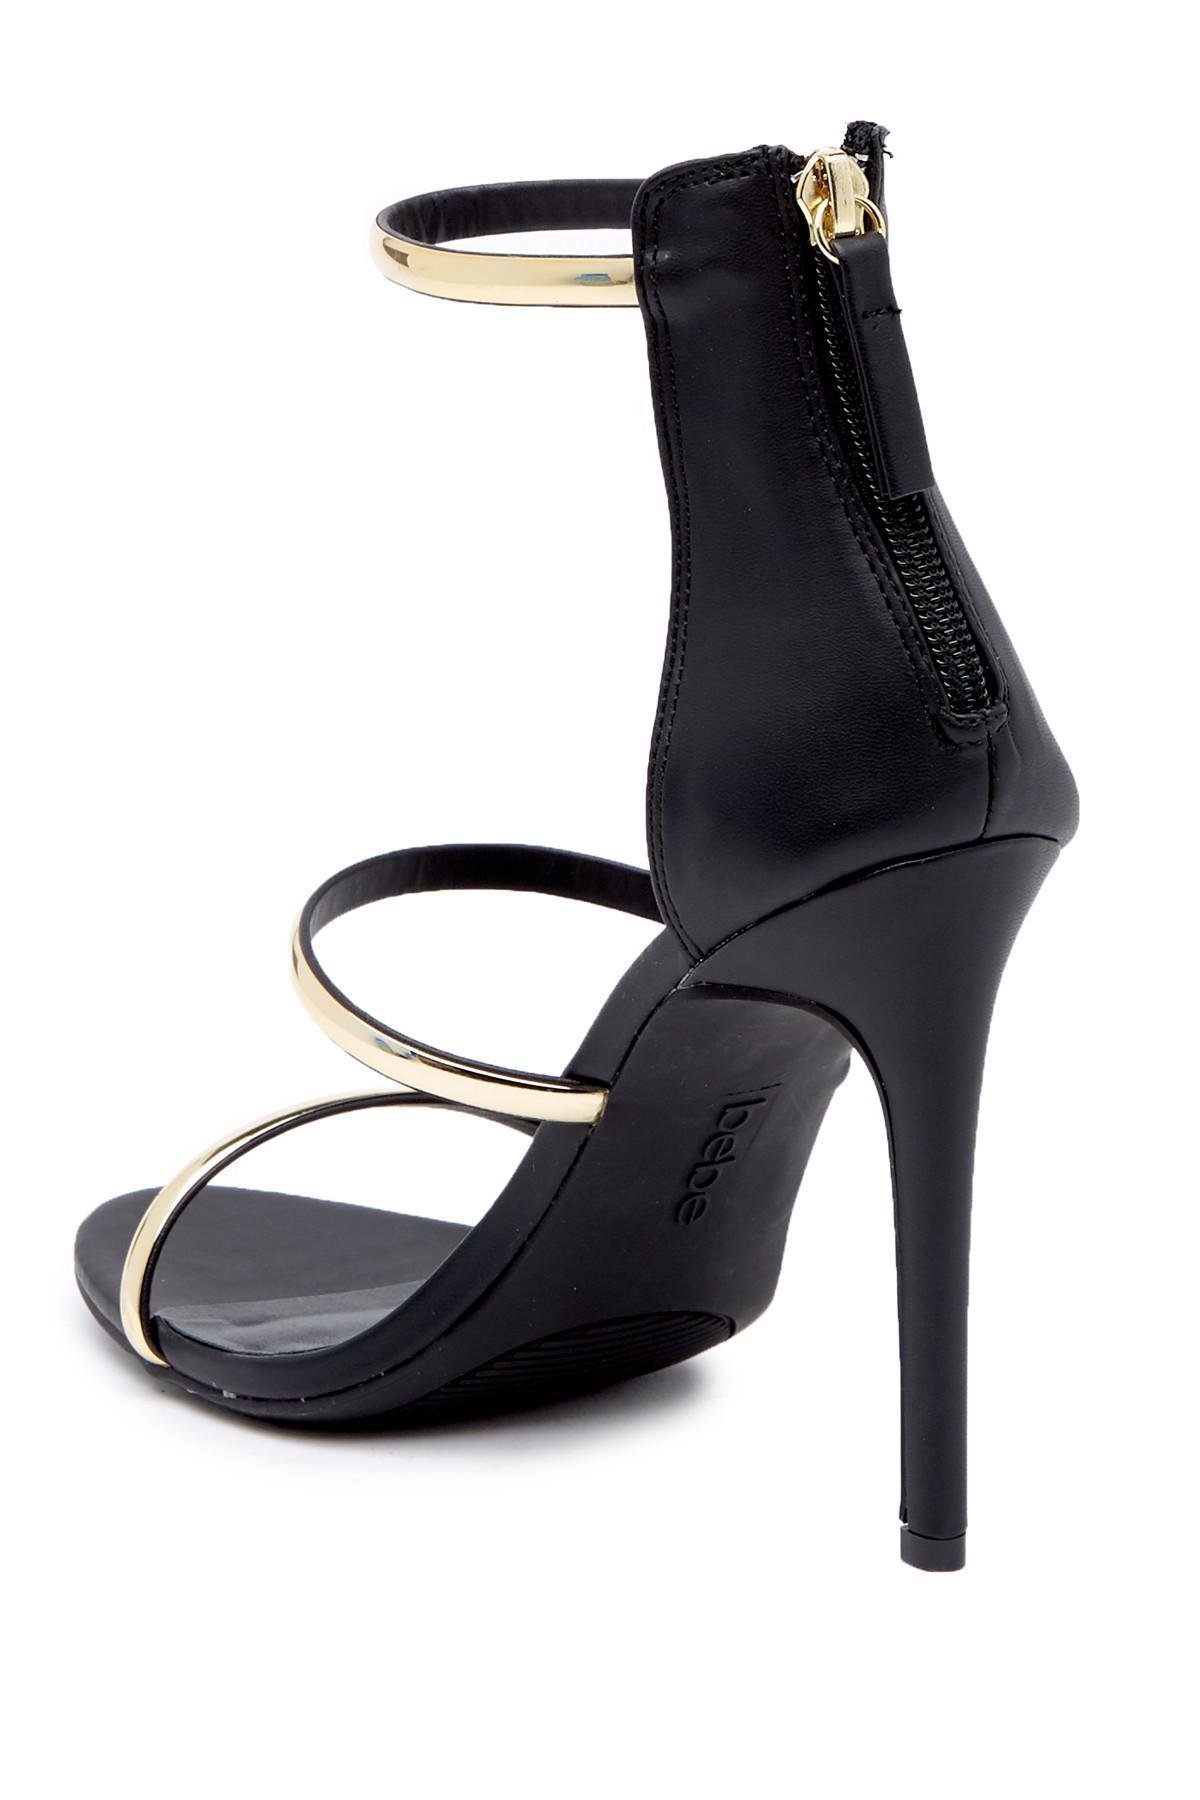 1b3b0e9ee81 Bebe - Black Berdine Strappy Stiletto Sandal - Lyst. View fullscreen